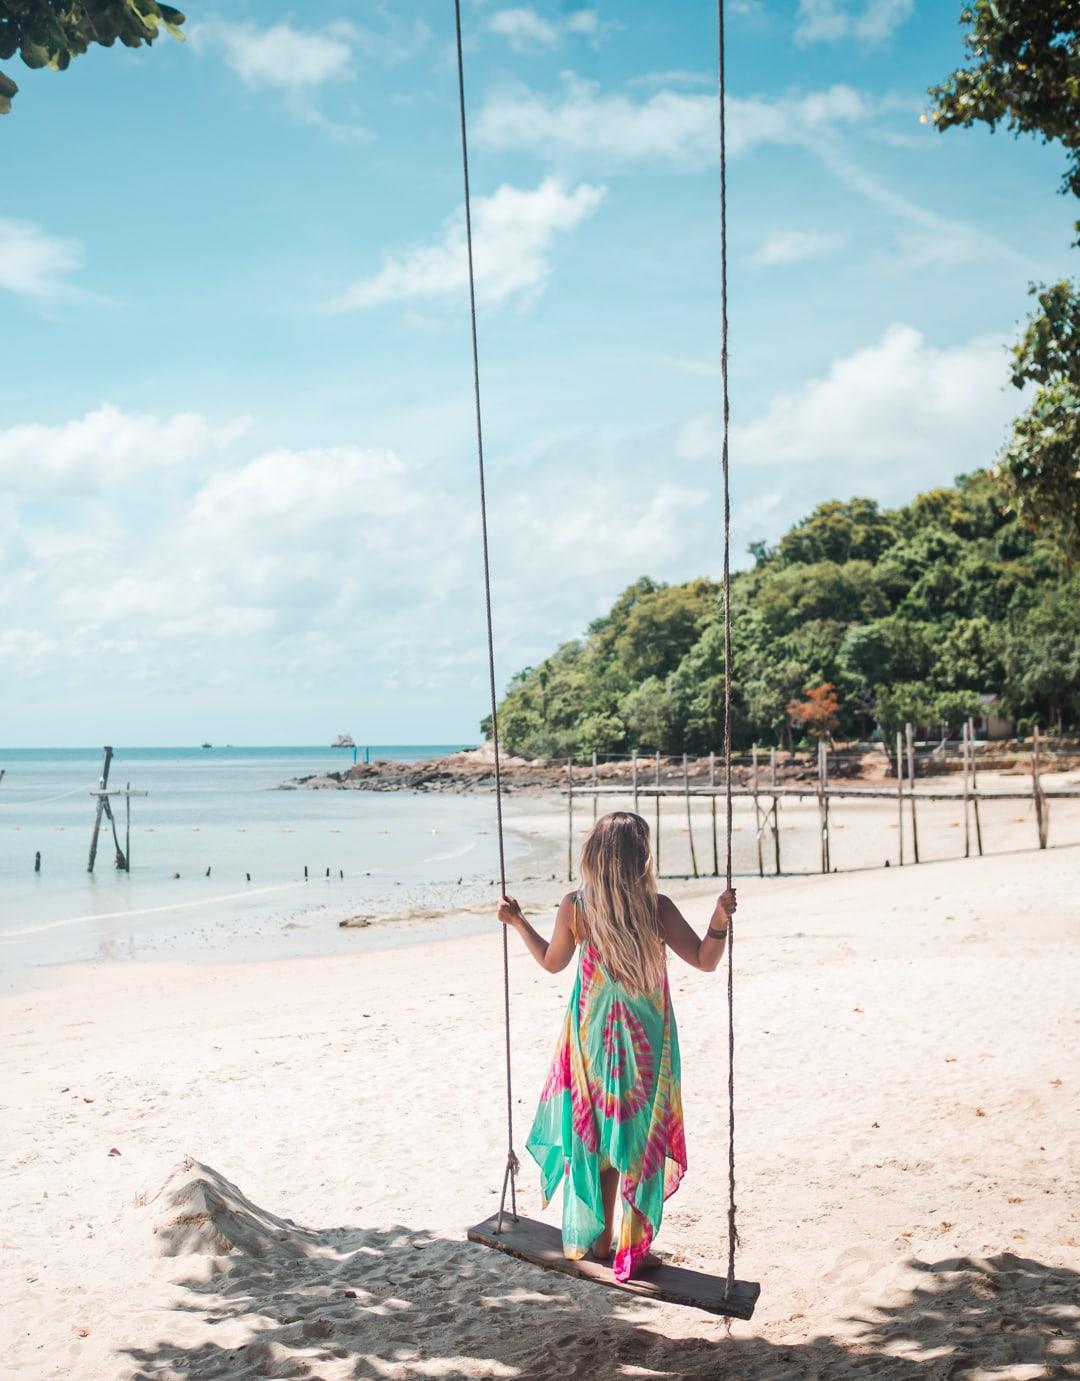 Koh Samet - The sunniest island close to Bangkok, Thailand